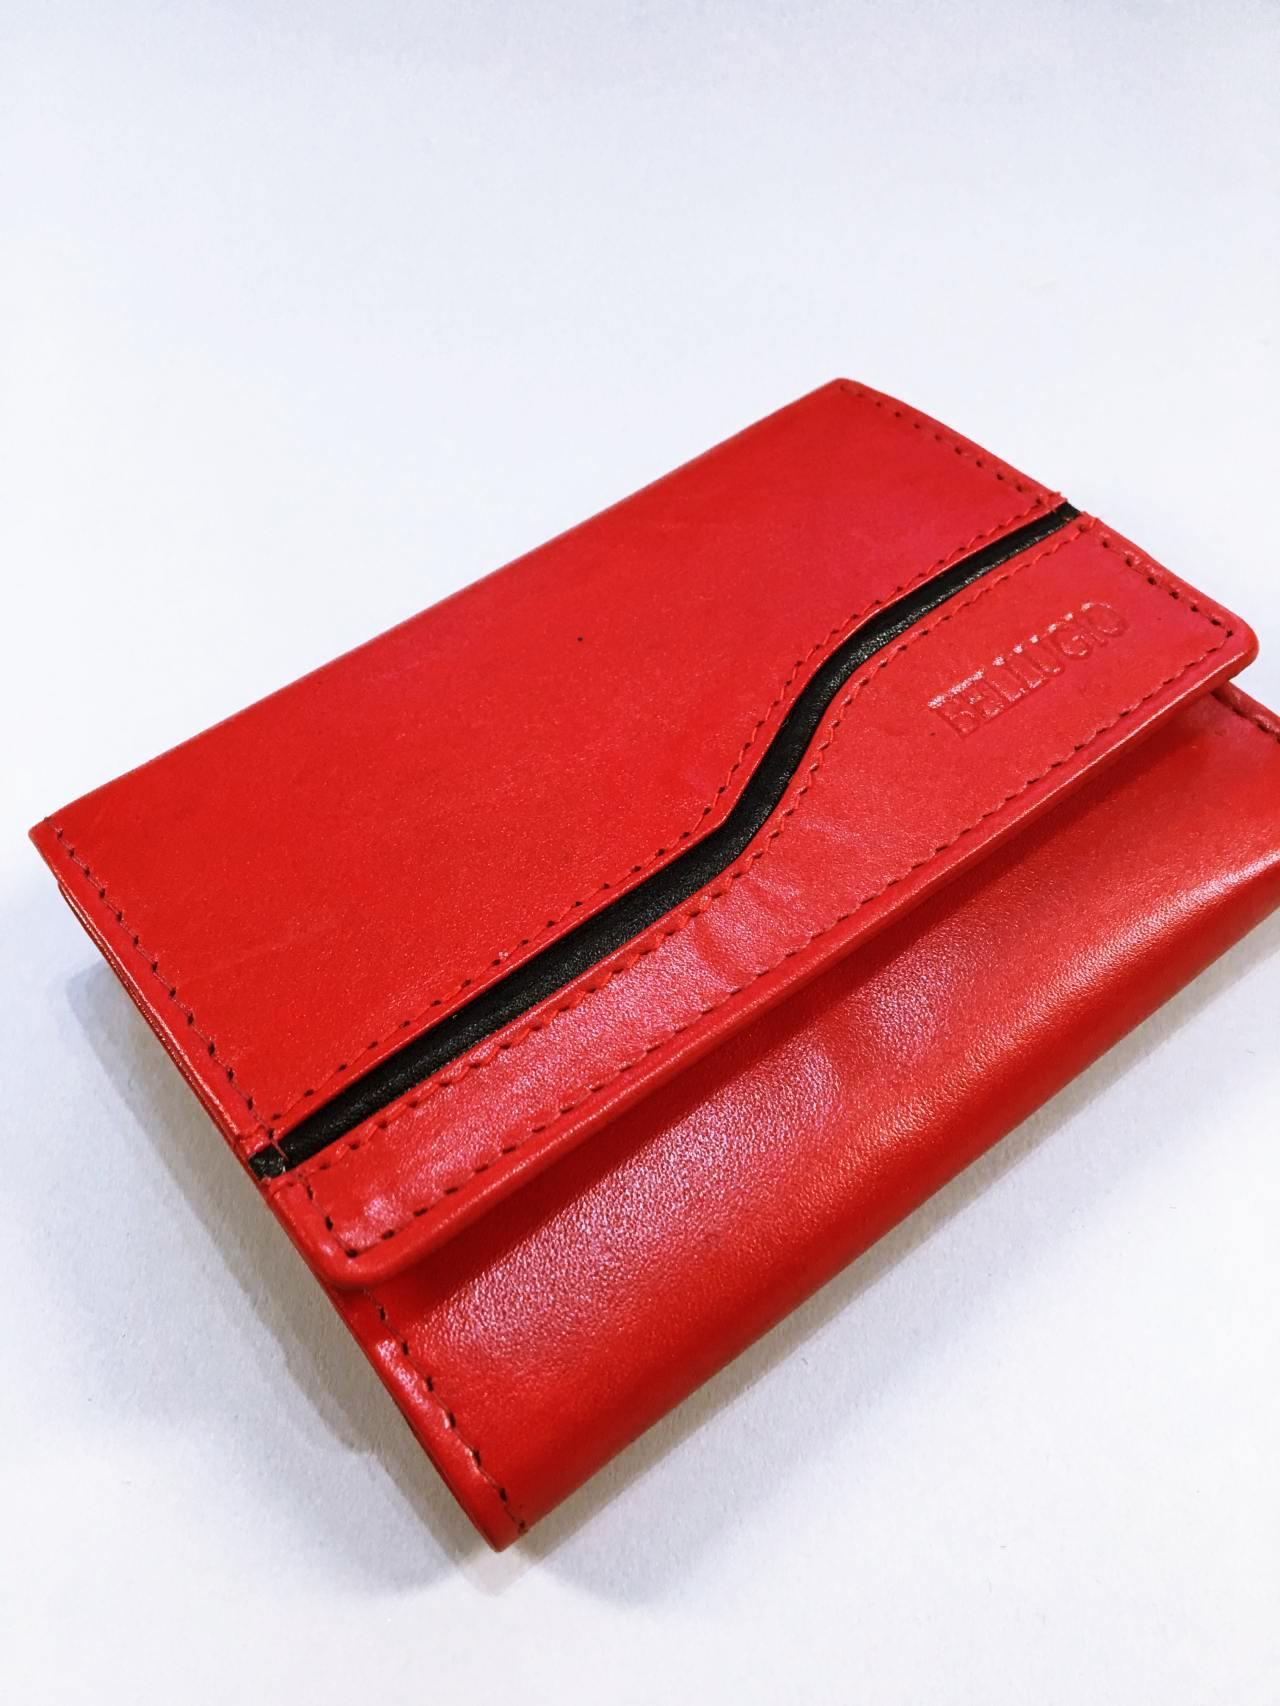 Kožená peněženka Bellugio červená 02